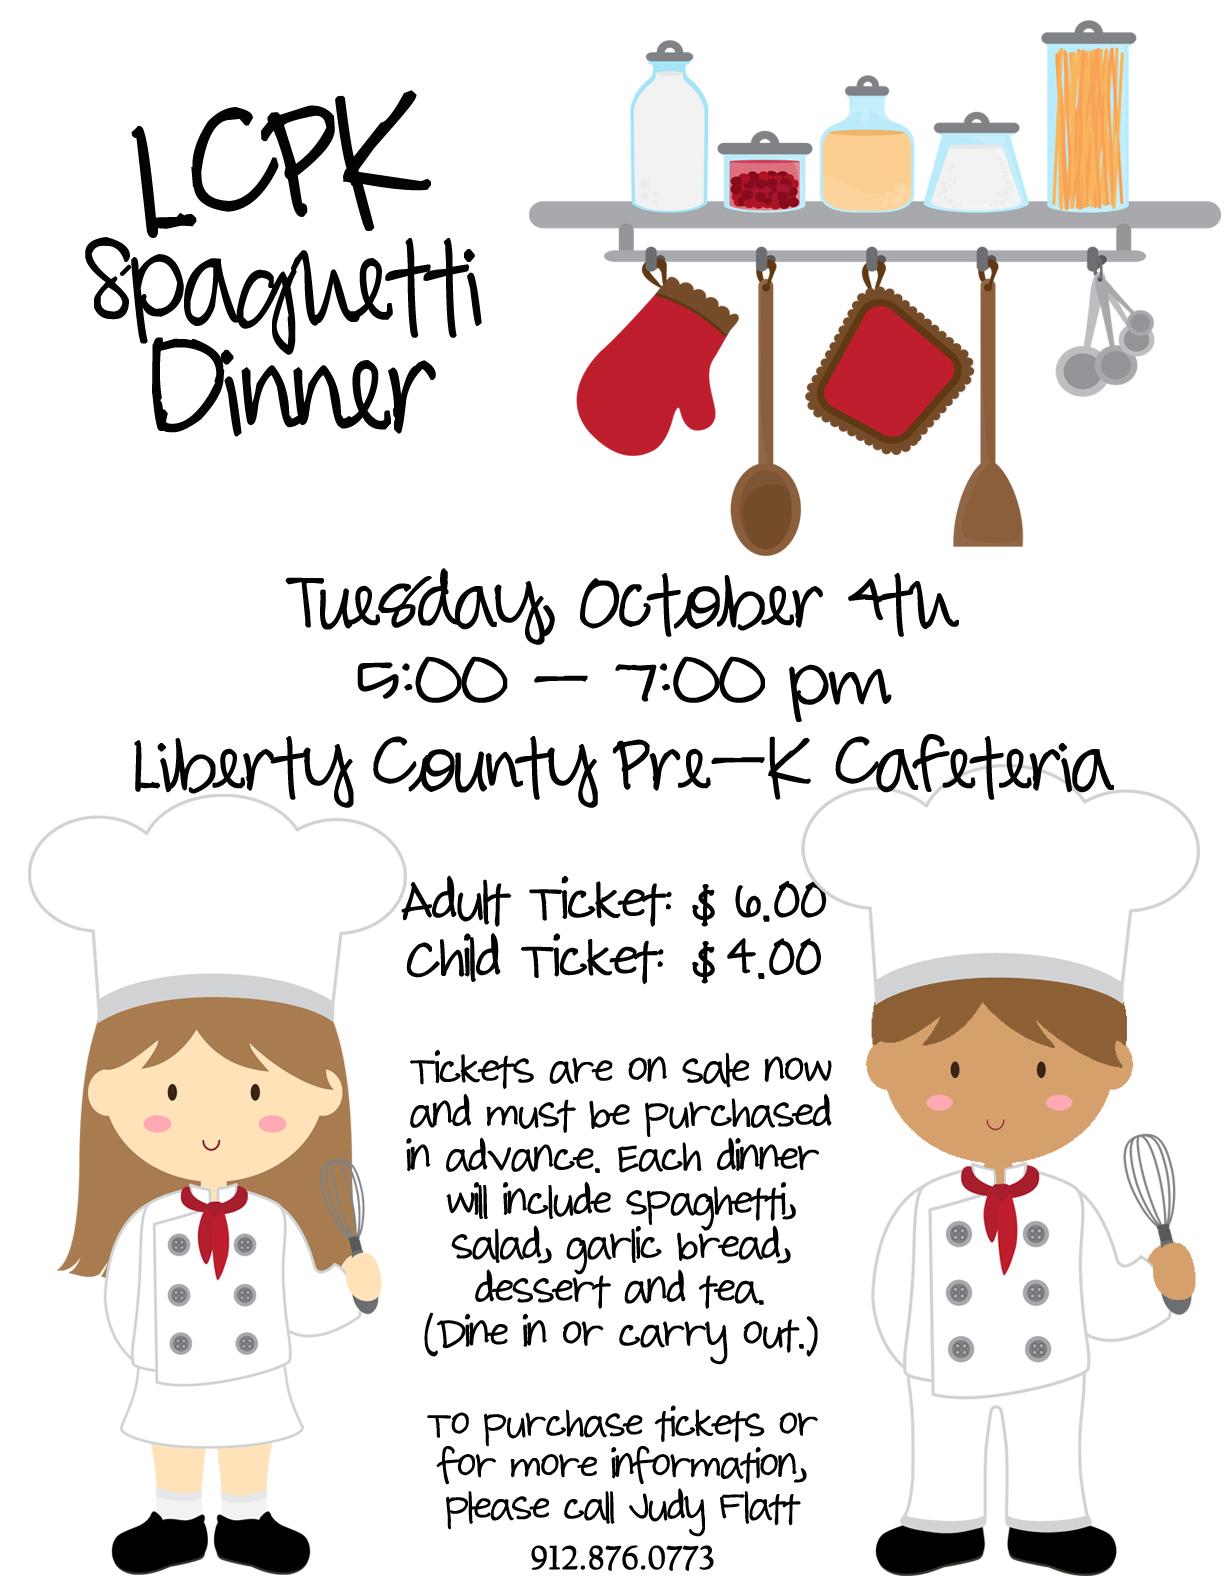 spaghetti dinner fundraiser flyer template aildoc productoseb co